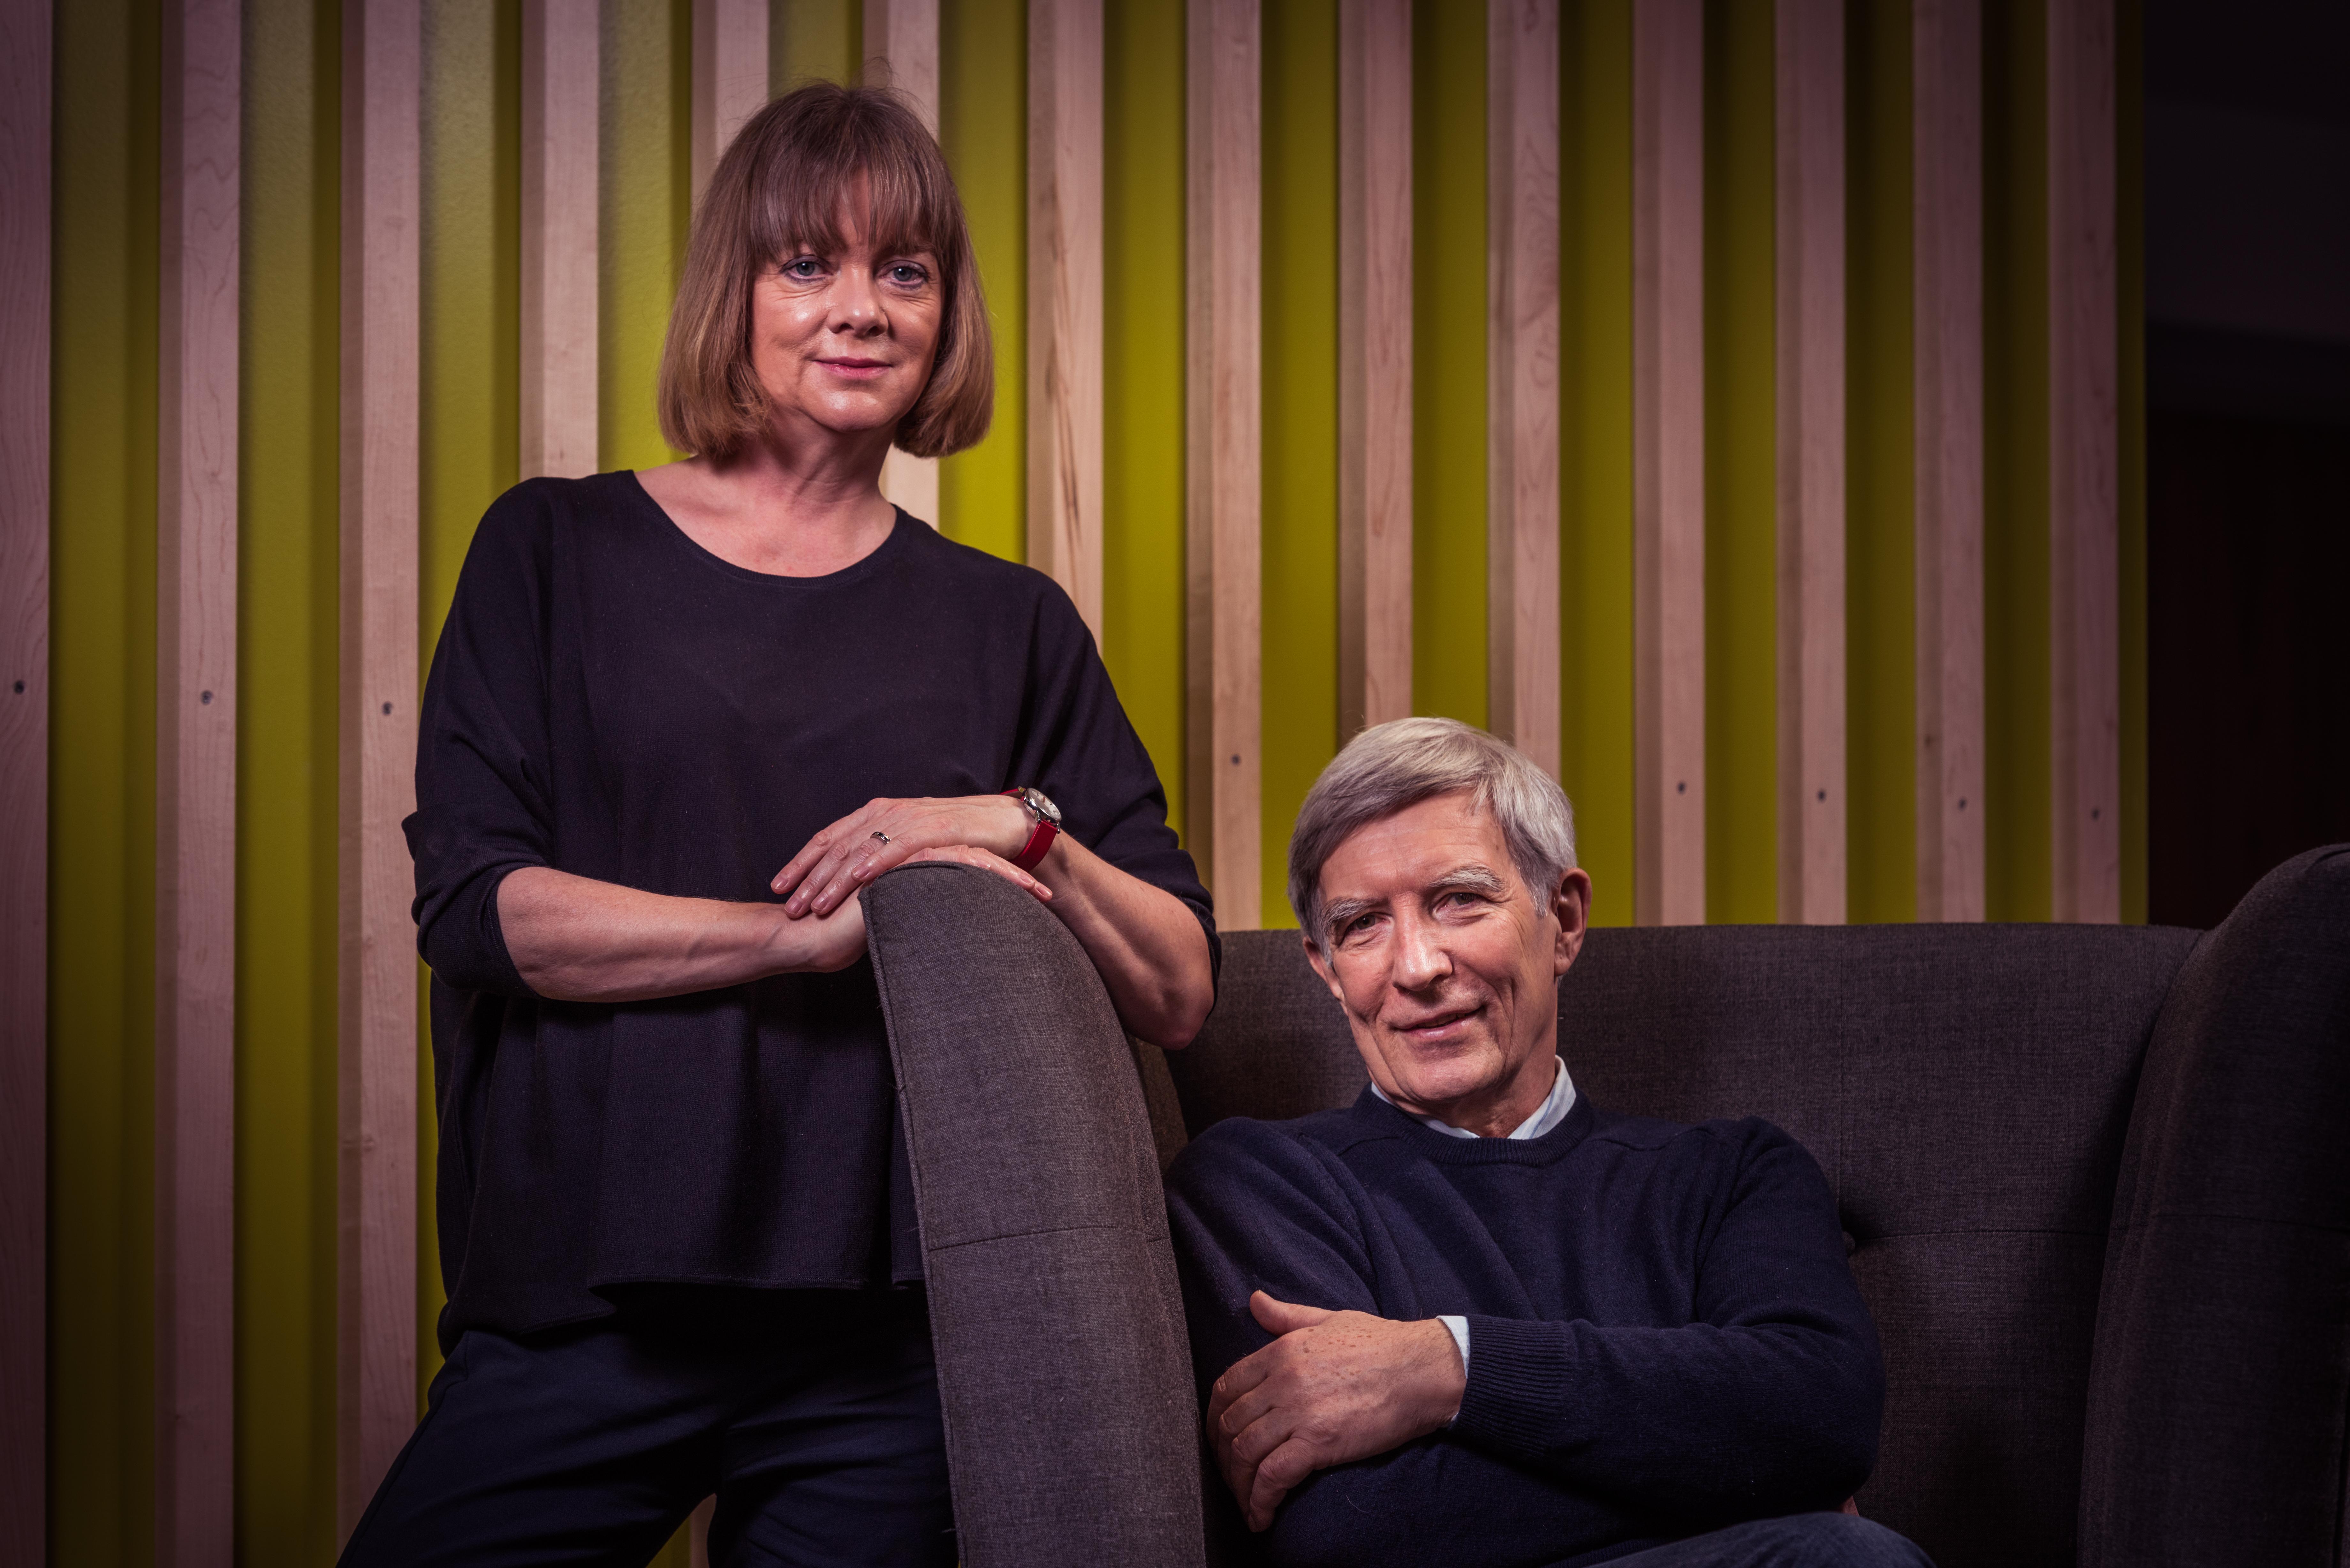 Professor Kate Pickett and Richard Wilkinson portrait by Alex Holland